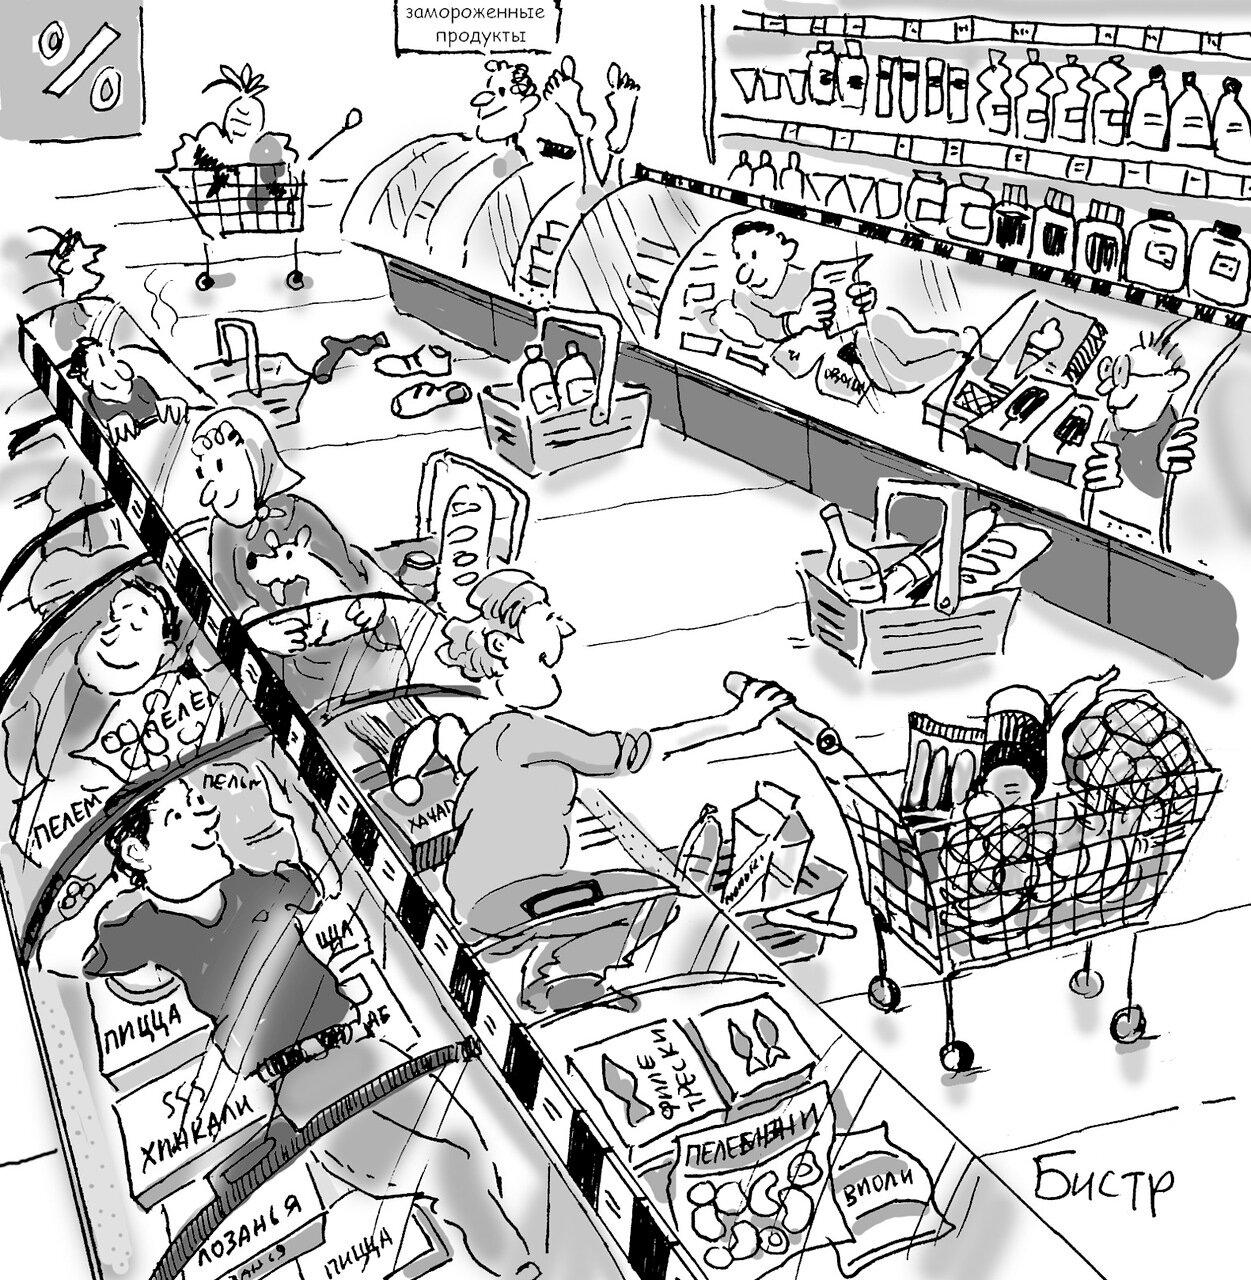 14 0522 Supermarket.jpg